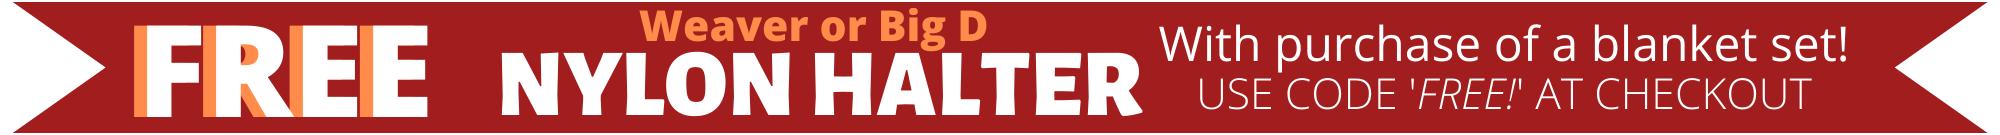 Free Nylon Halter